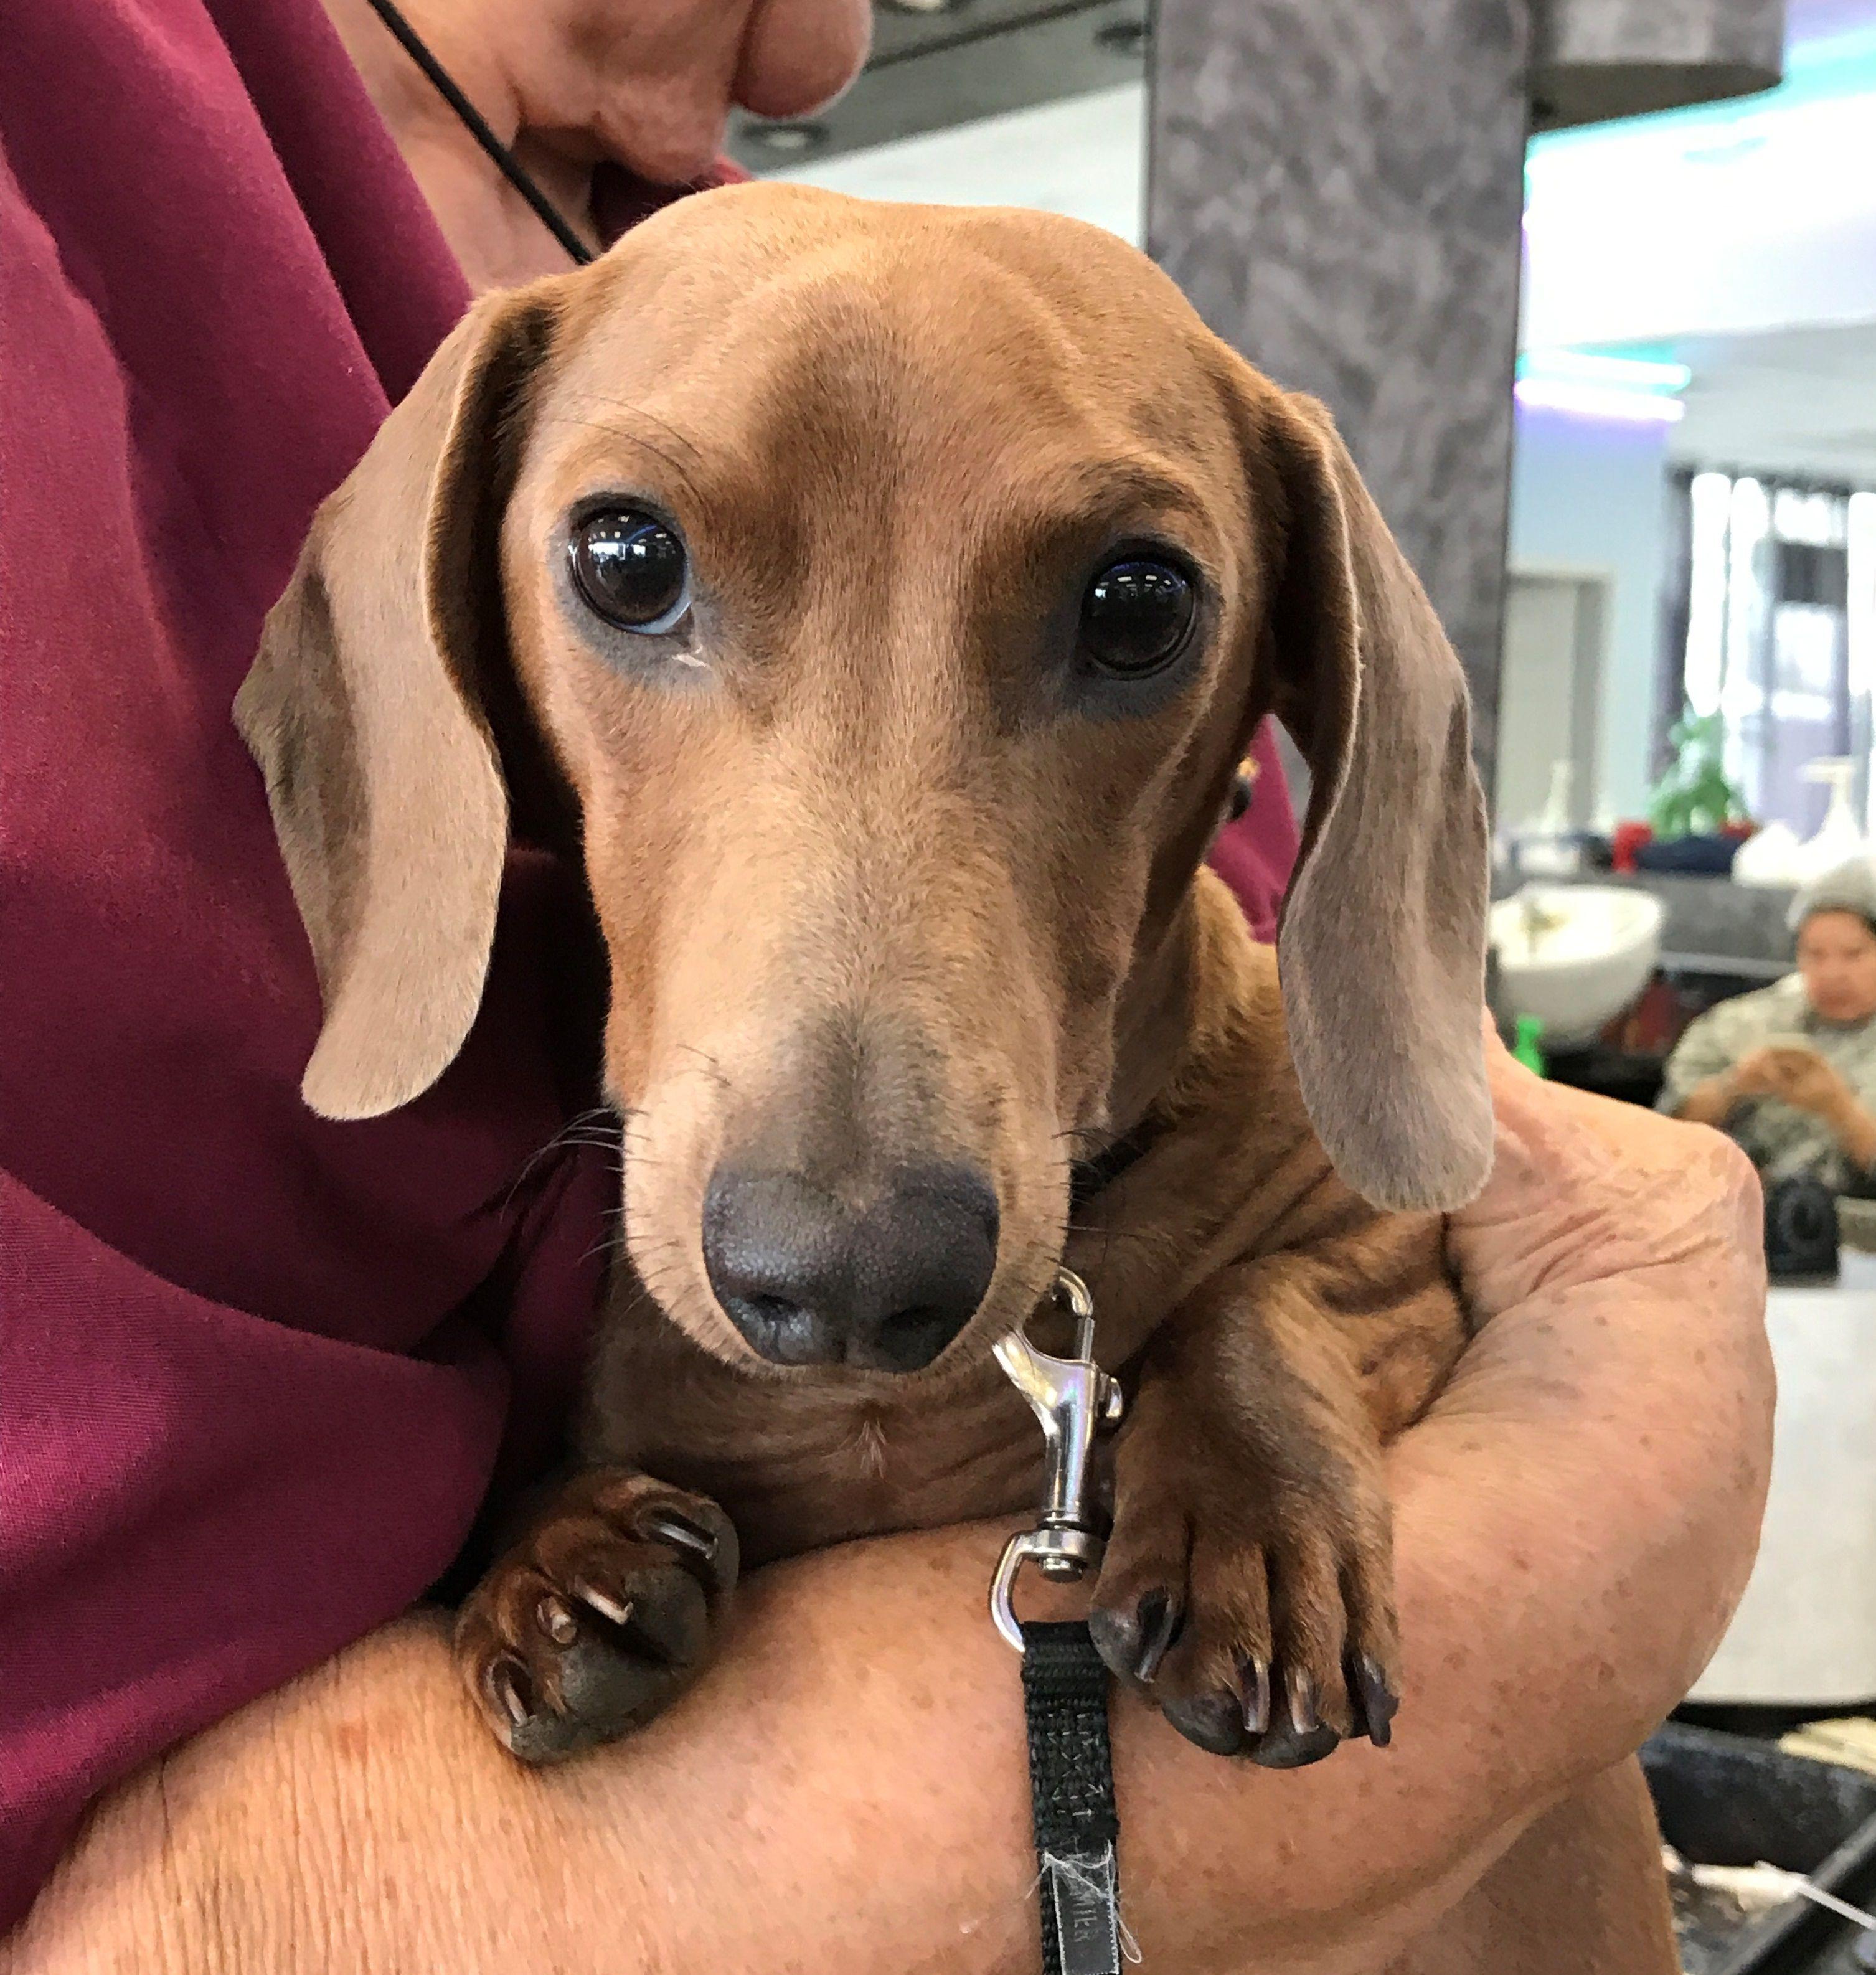 Dachshund dog for Adoption in Pearland, TX. ADN695910 on